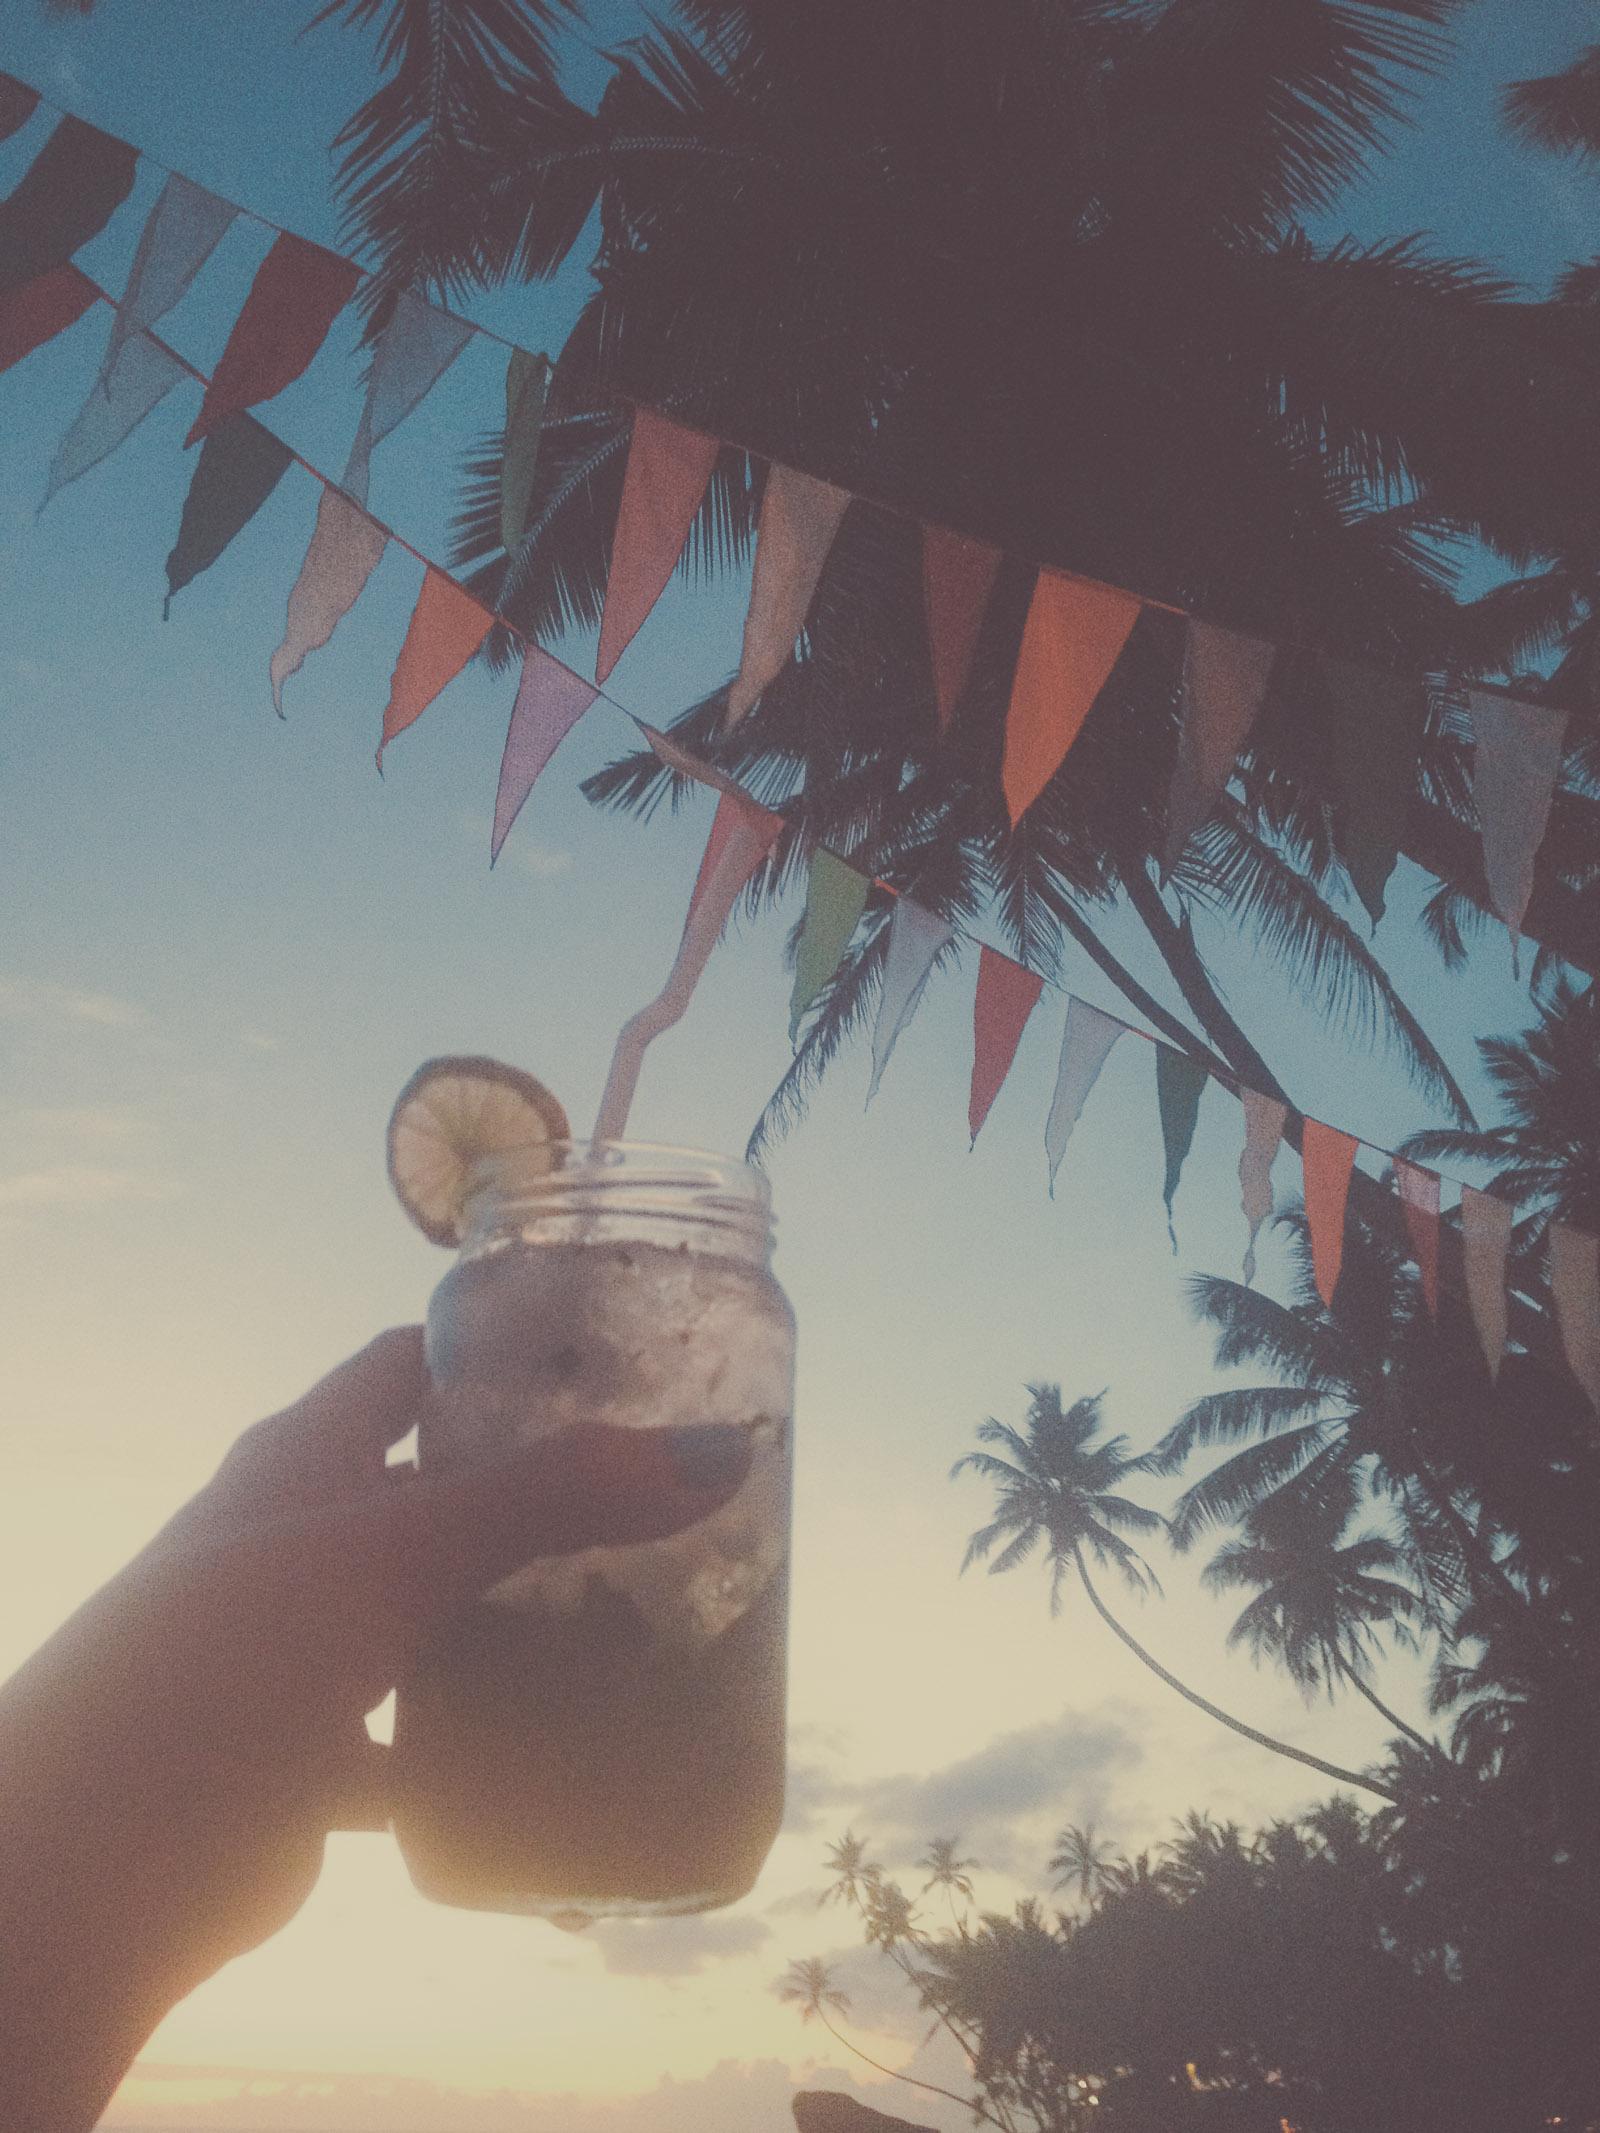 Sunshinestories-surf-travel-blog-IMG_4996